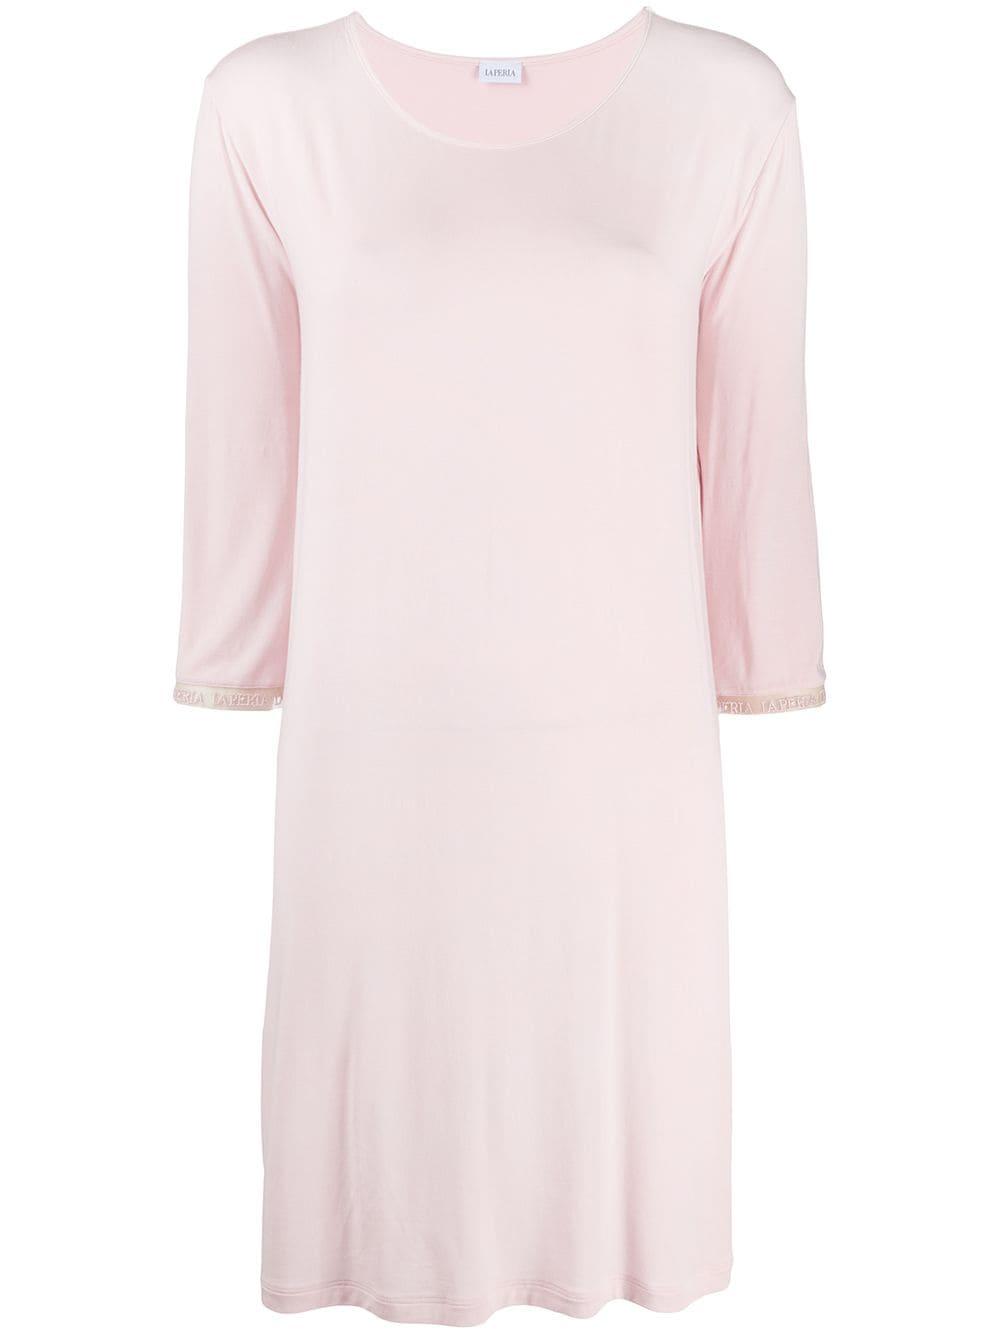 My Imagine Nightgown